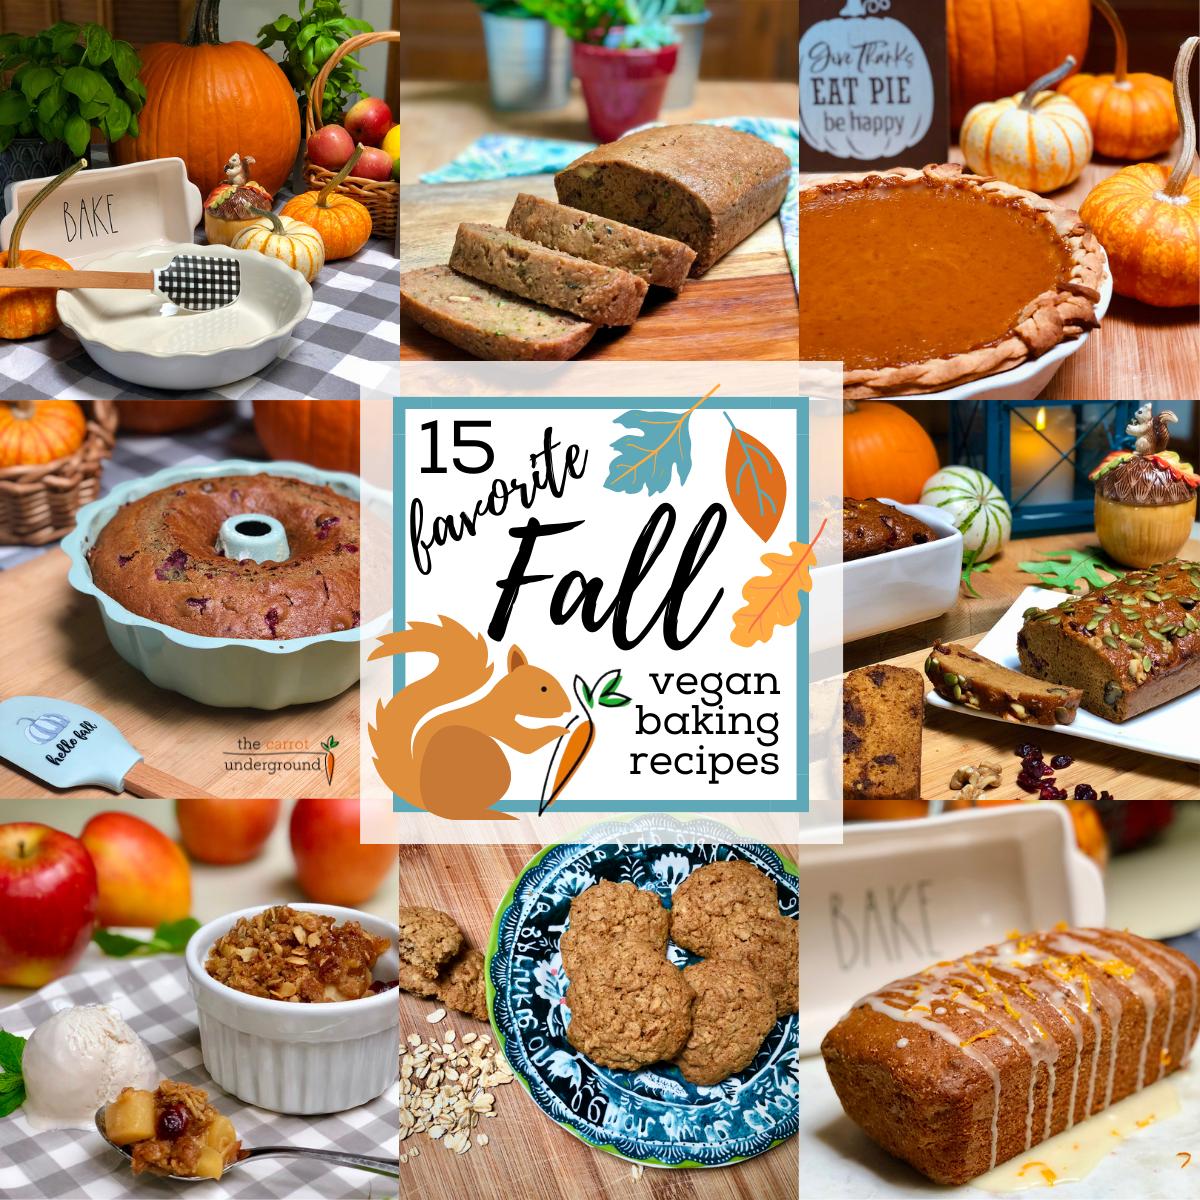 Images of Fall inspired vegan baked goods including zucchini bread, pumpkin pie, applesauce cake, oatmeals cookies, pumpkin bread, apple crisp and orange cranberry bread.